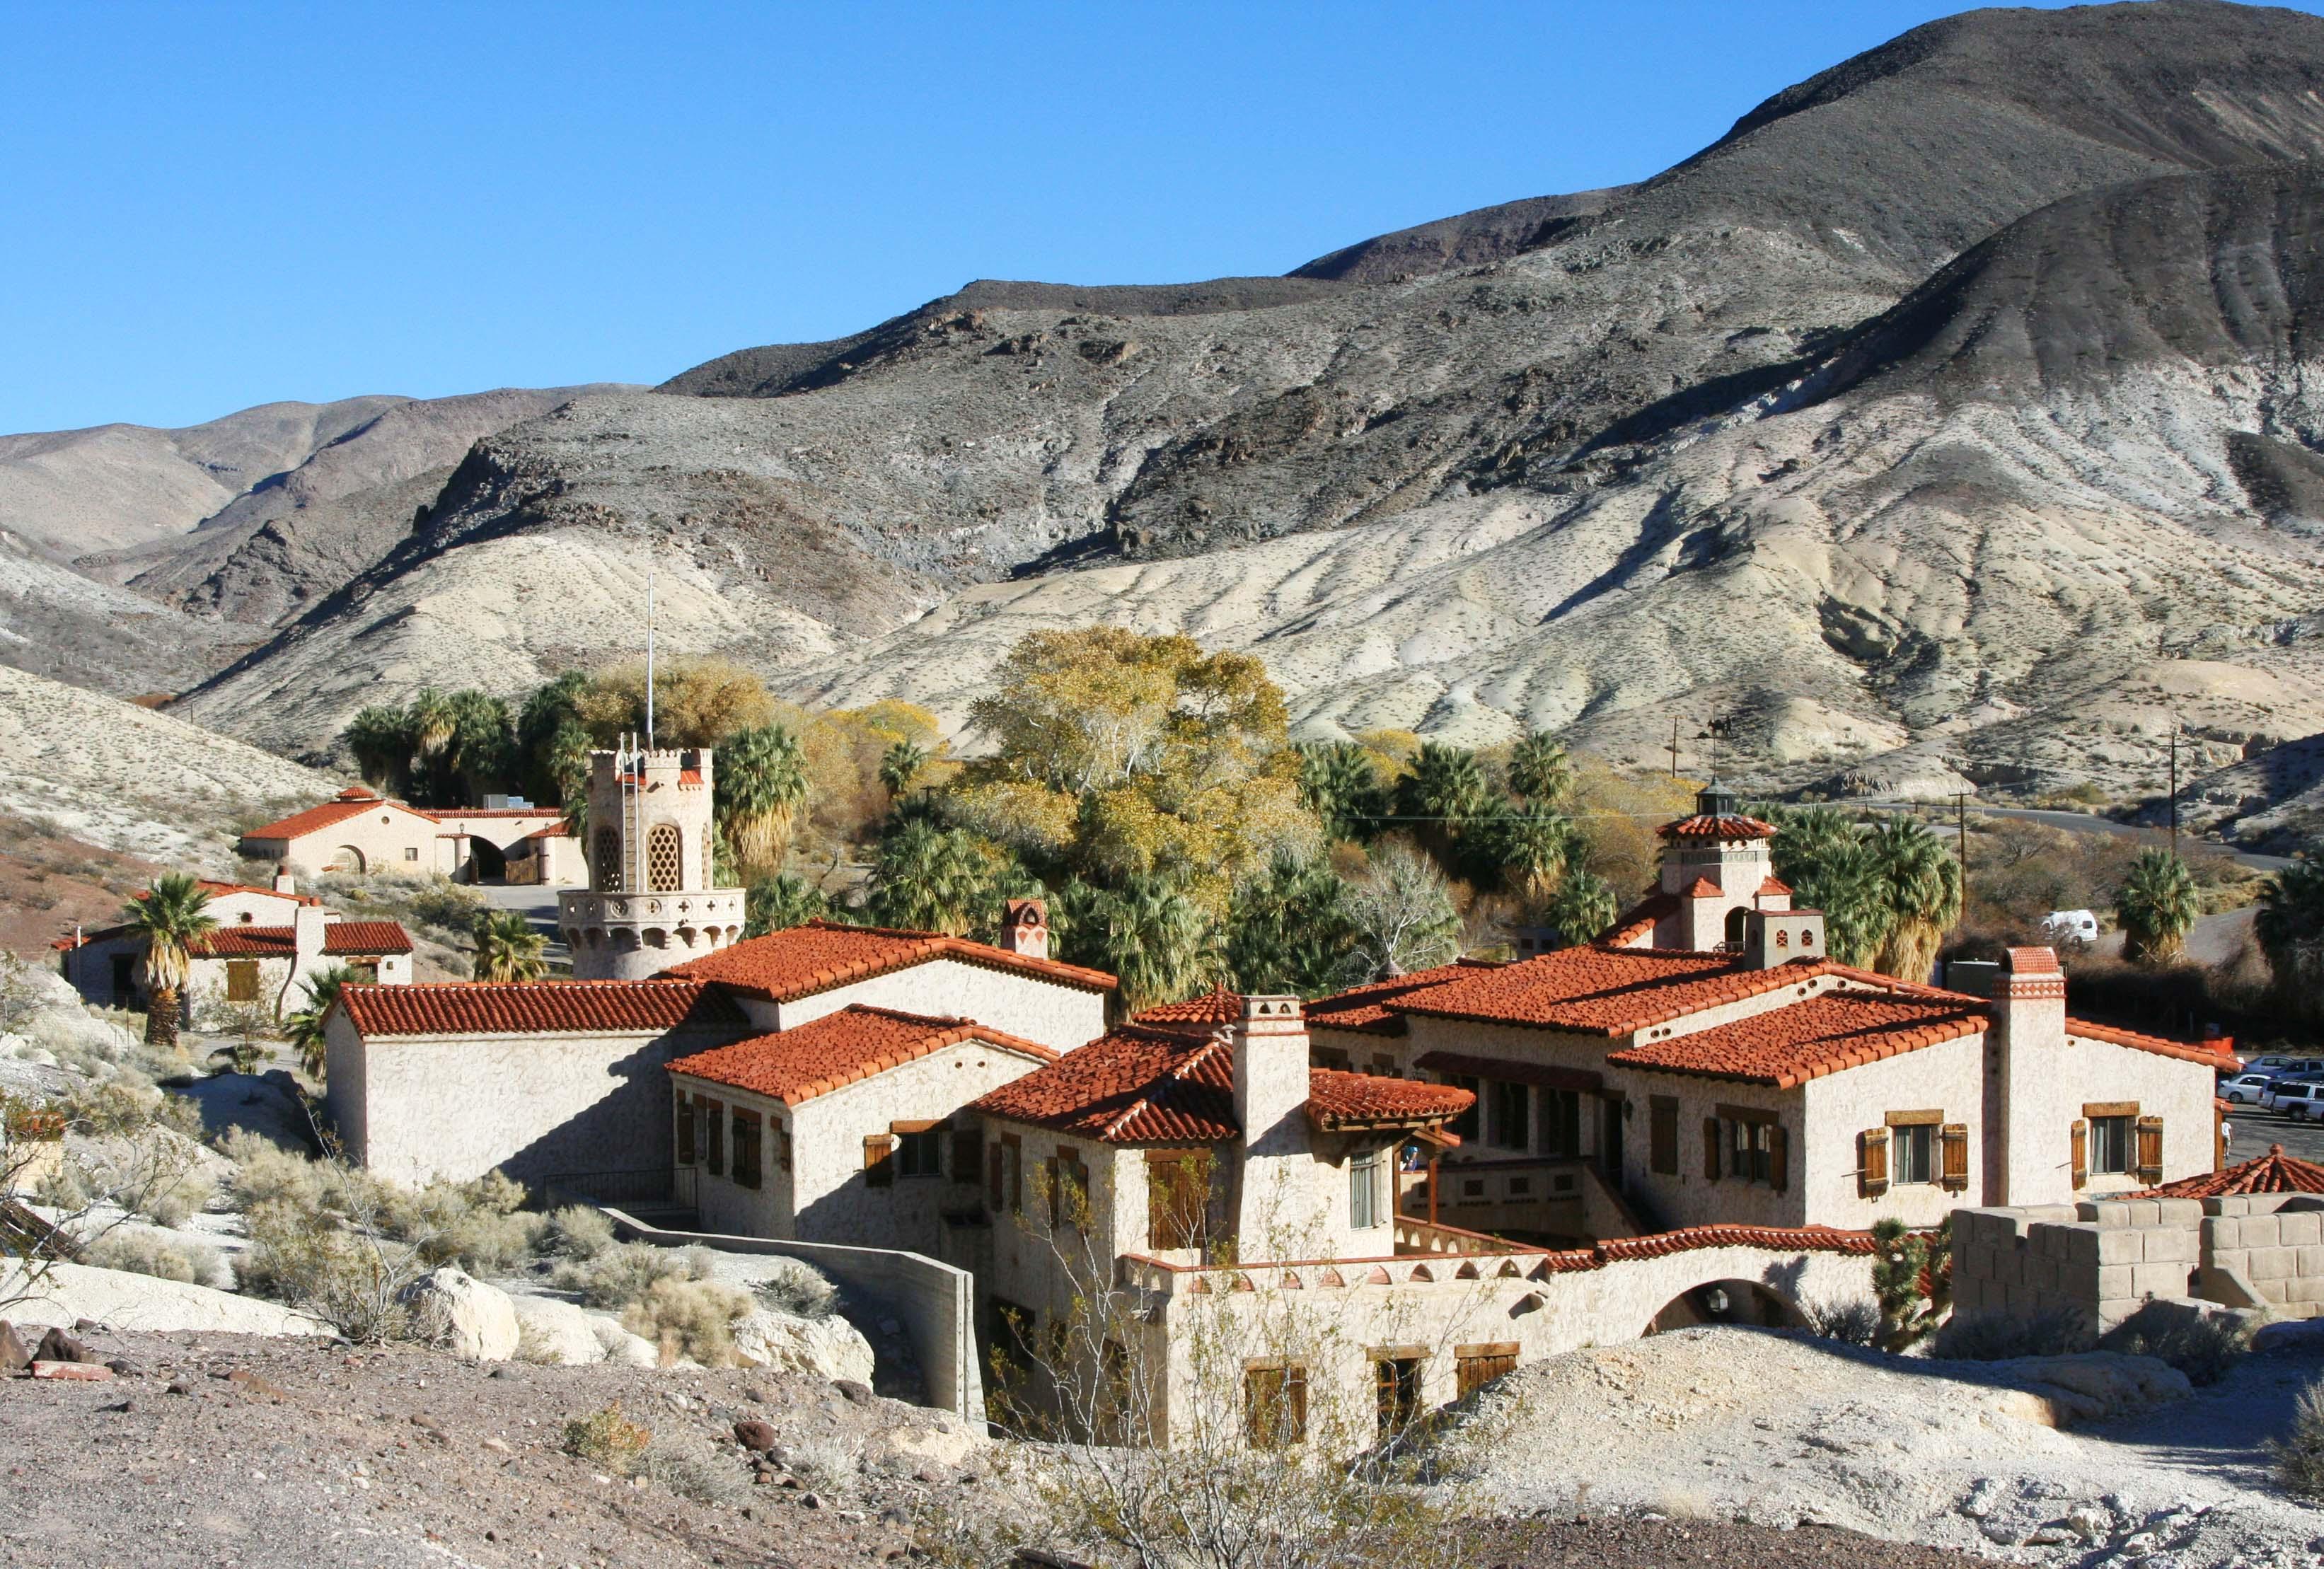 Scotty's Castle, Death Valley. Photo by Curtis Mekemson.